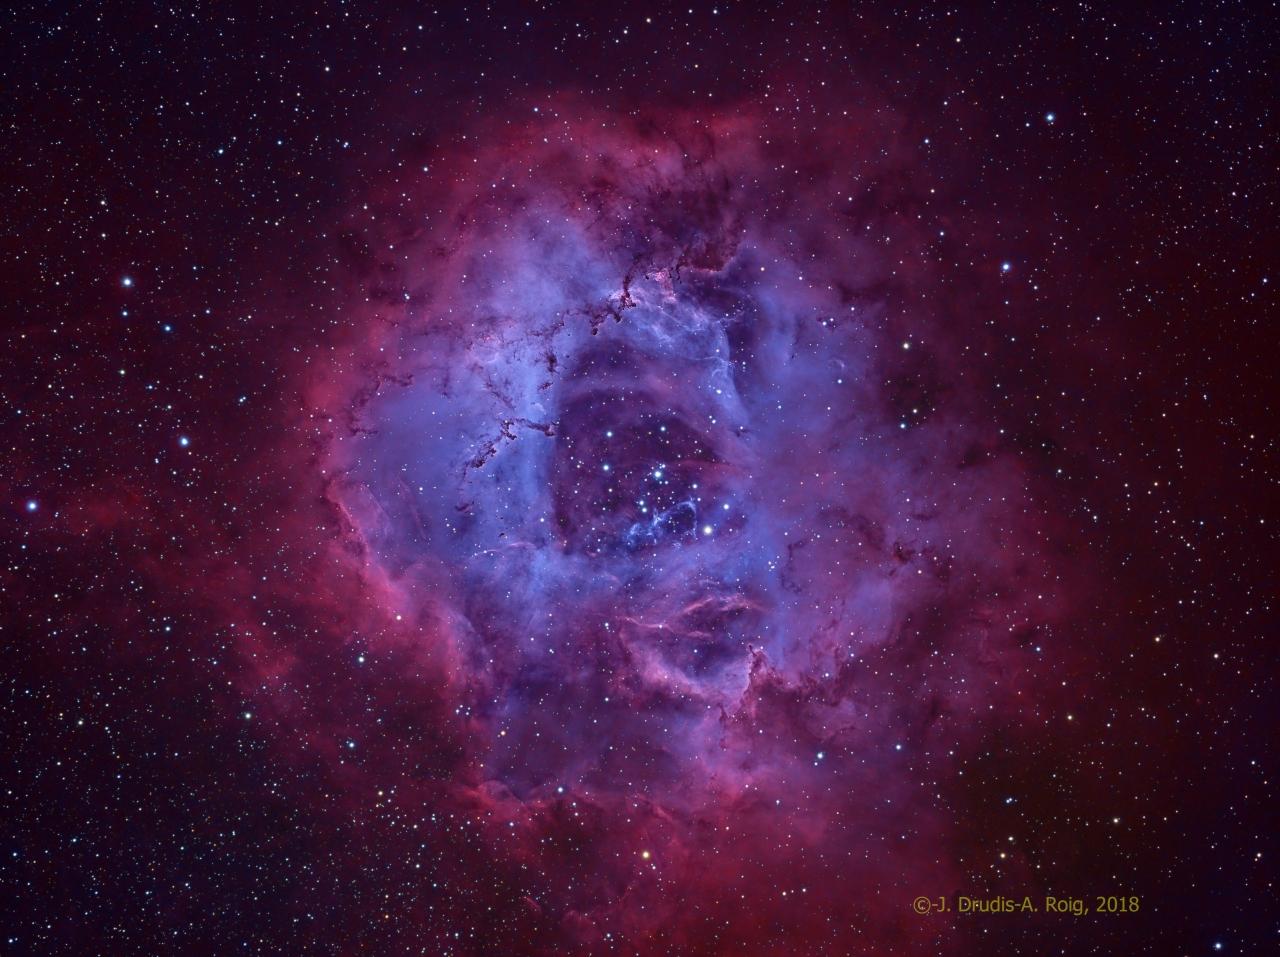 Rosette JM Drudis-Aleix Roig-HR